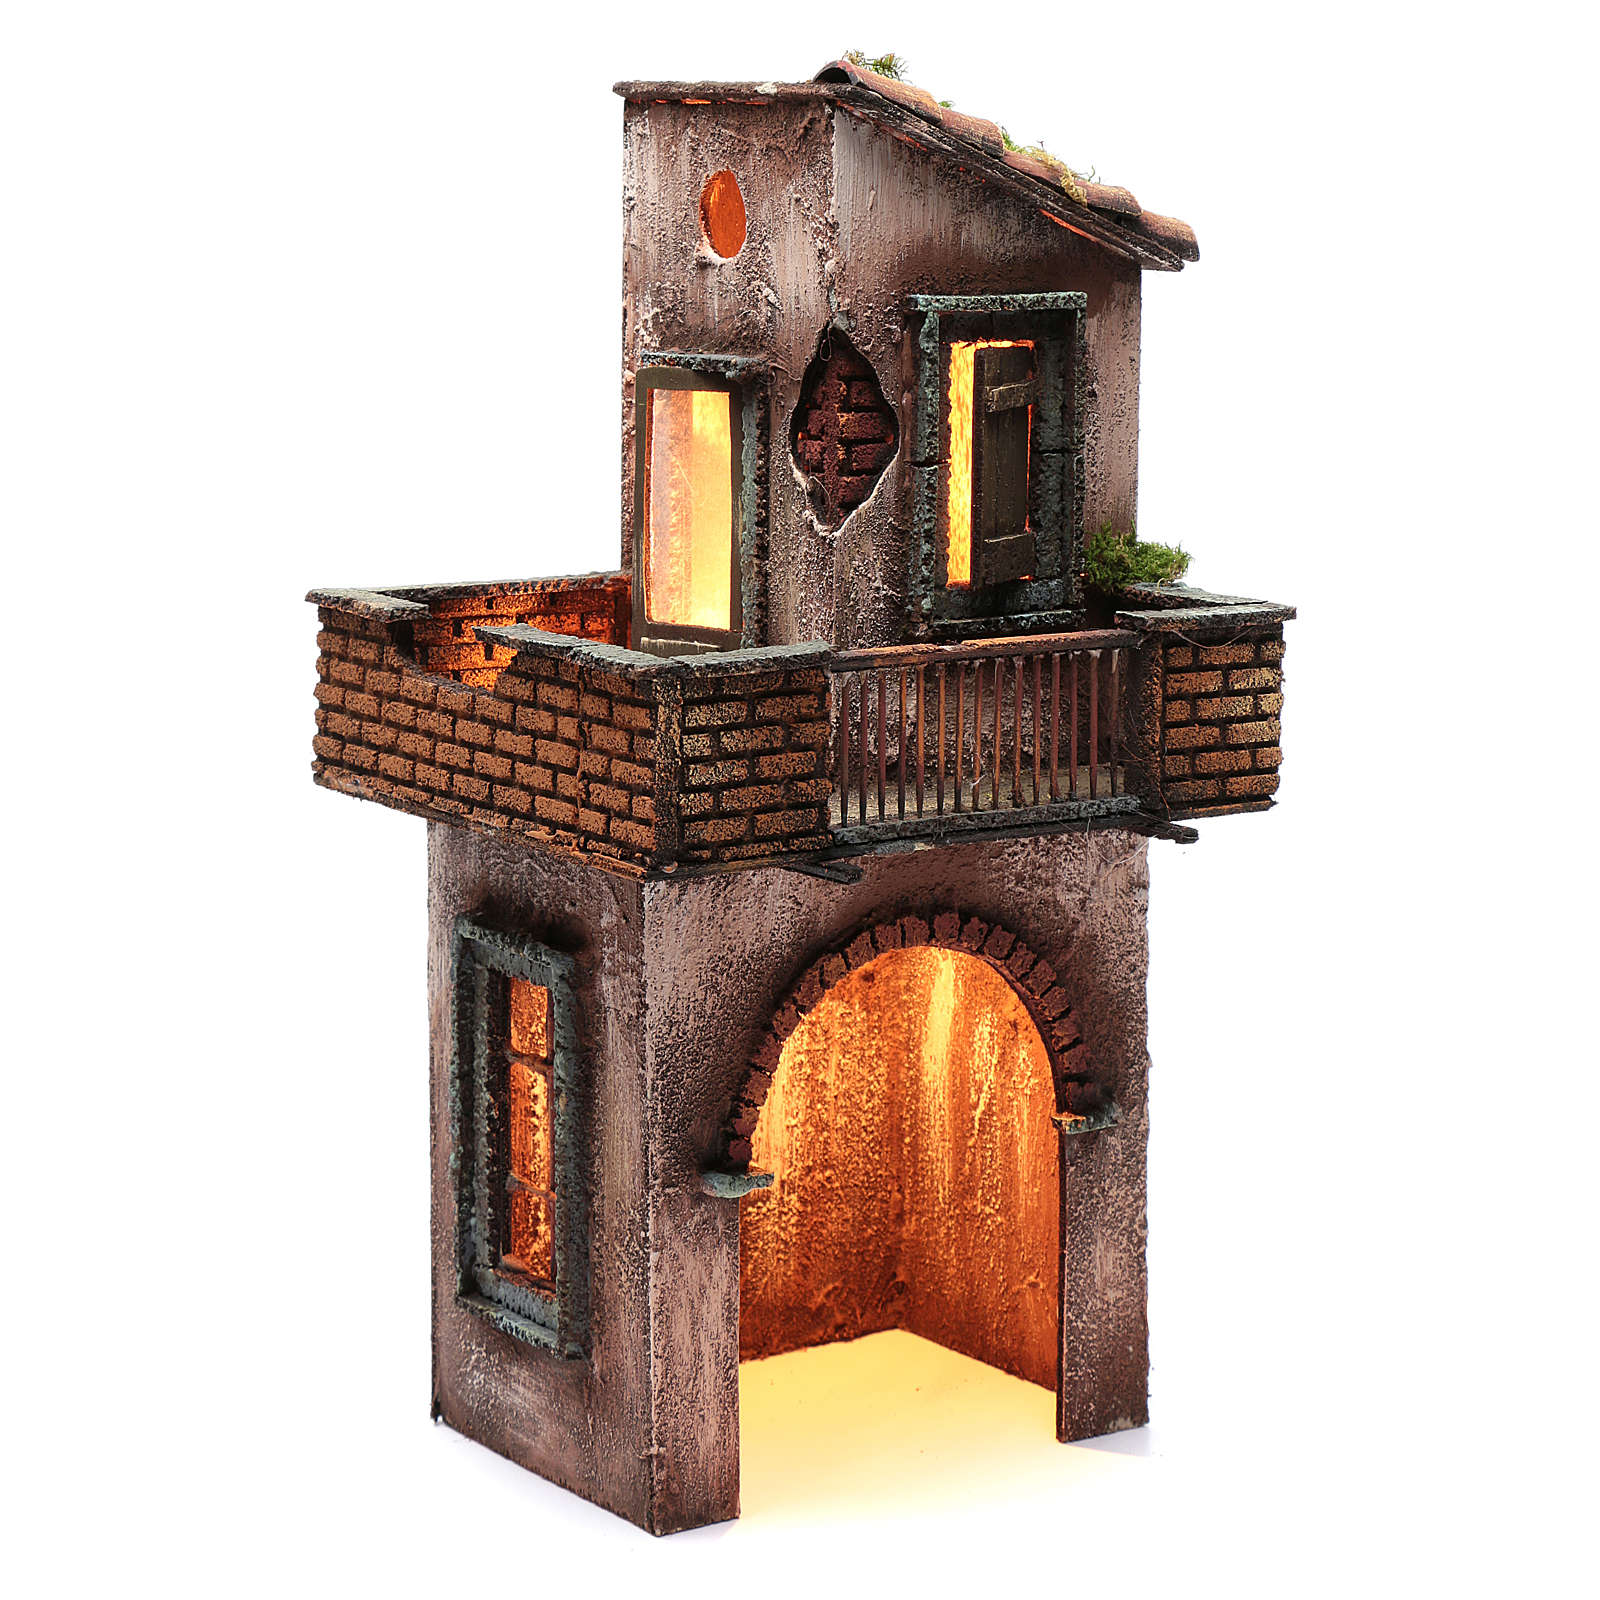 Neapolitan nativity scene setting with wooden house 41X22X20 cm 4